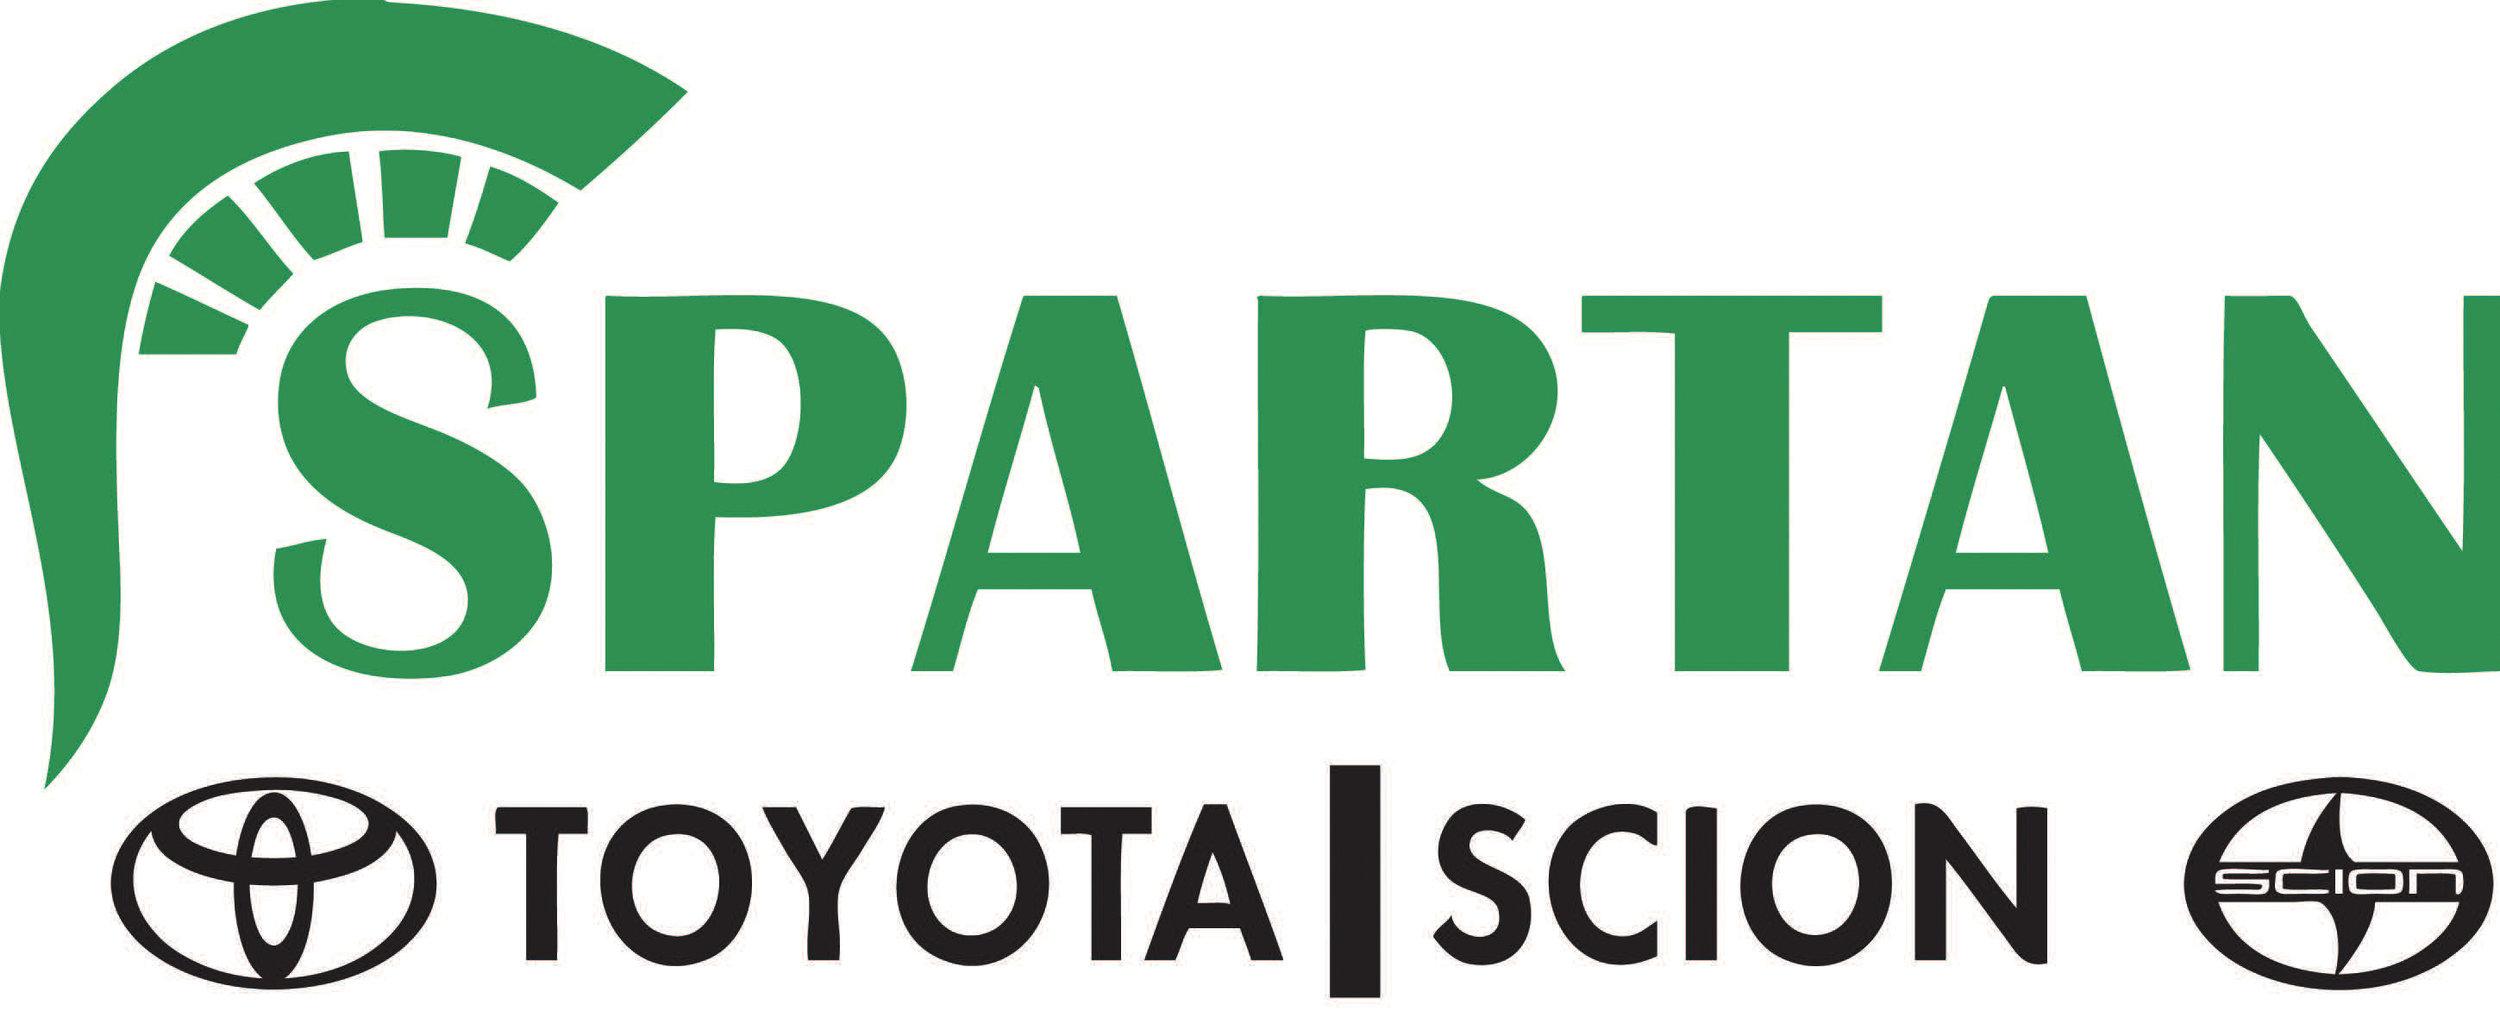 Spartan Toyota Logo.jpg